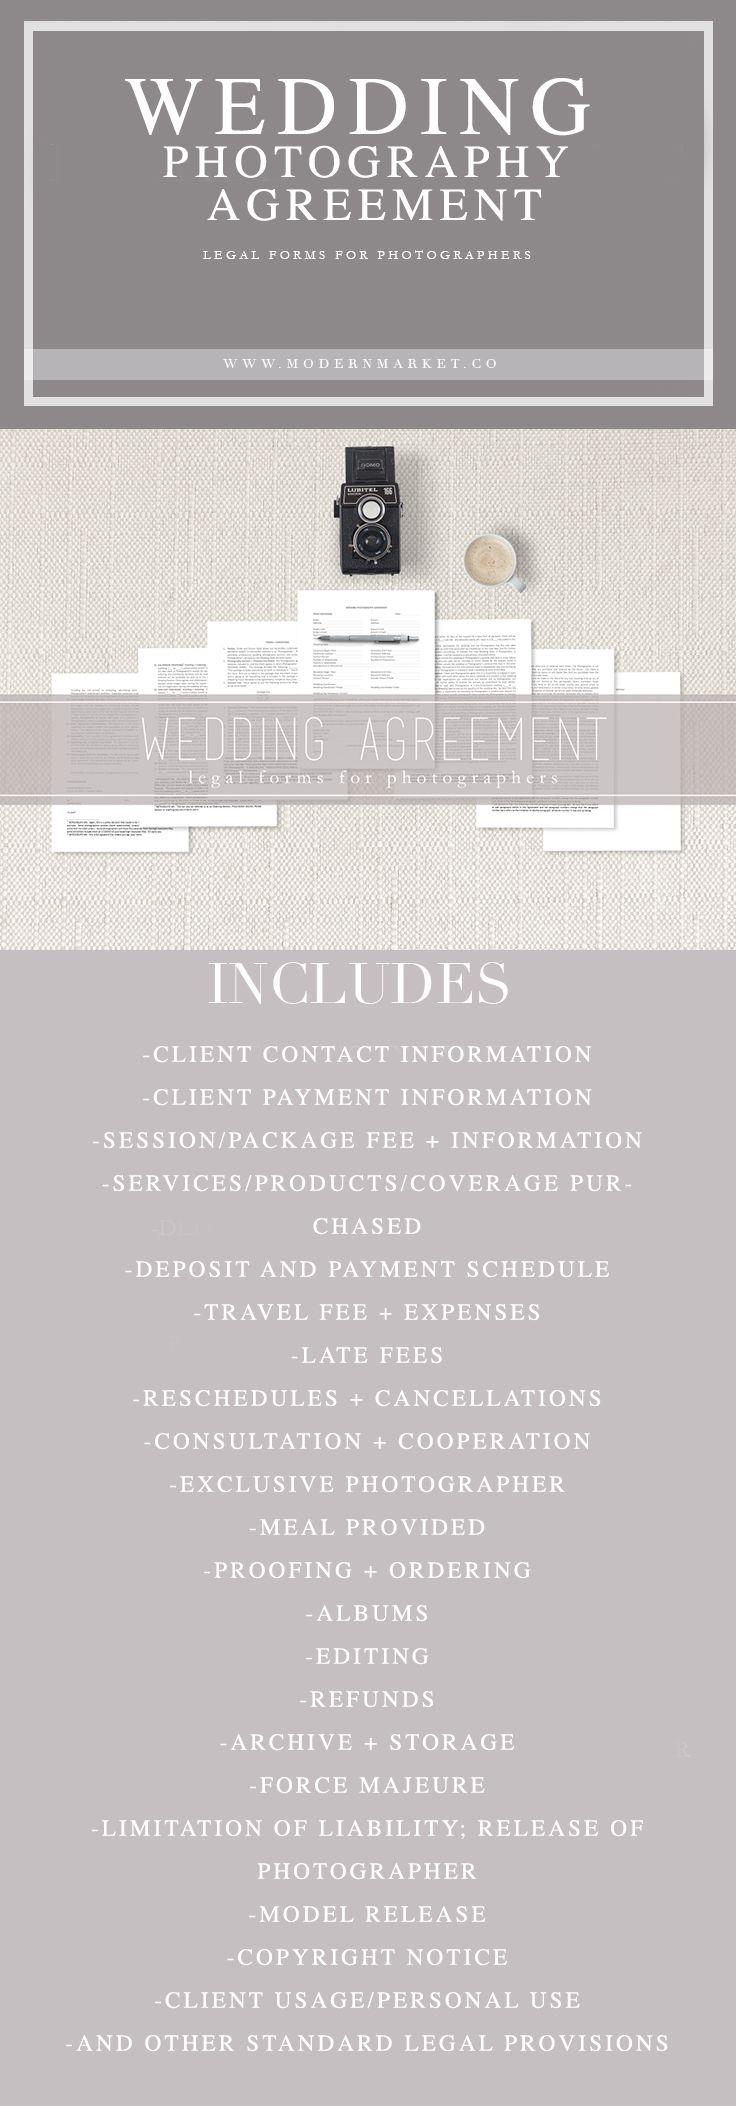 WEDDING PHOTOGRAPHERS - If you shoot weddings you need this! A easy to…